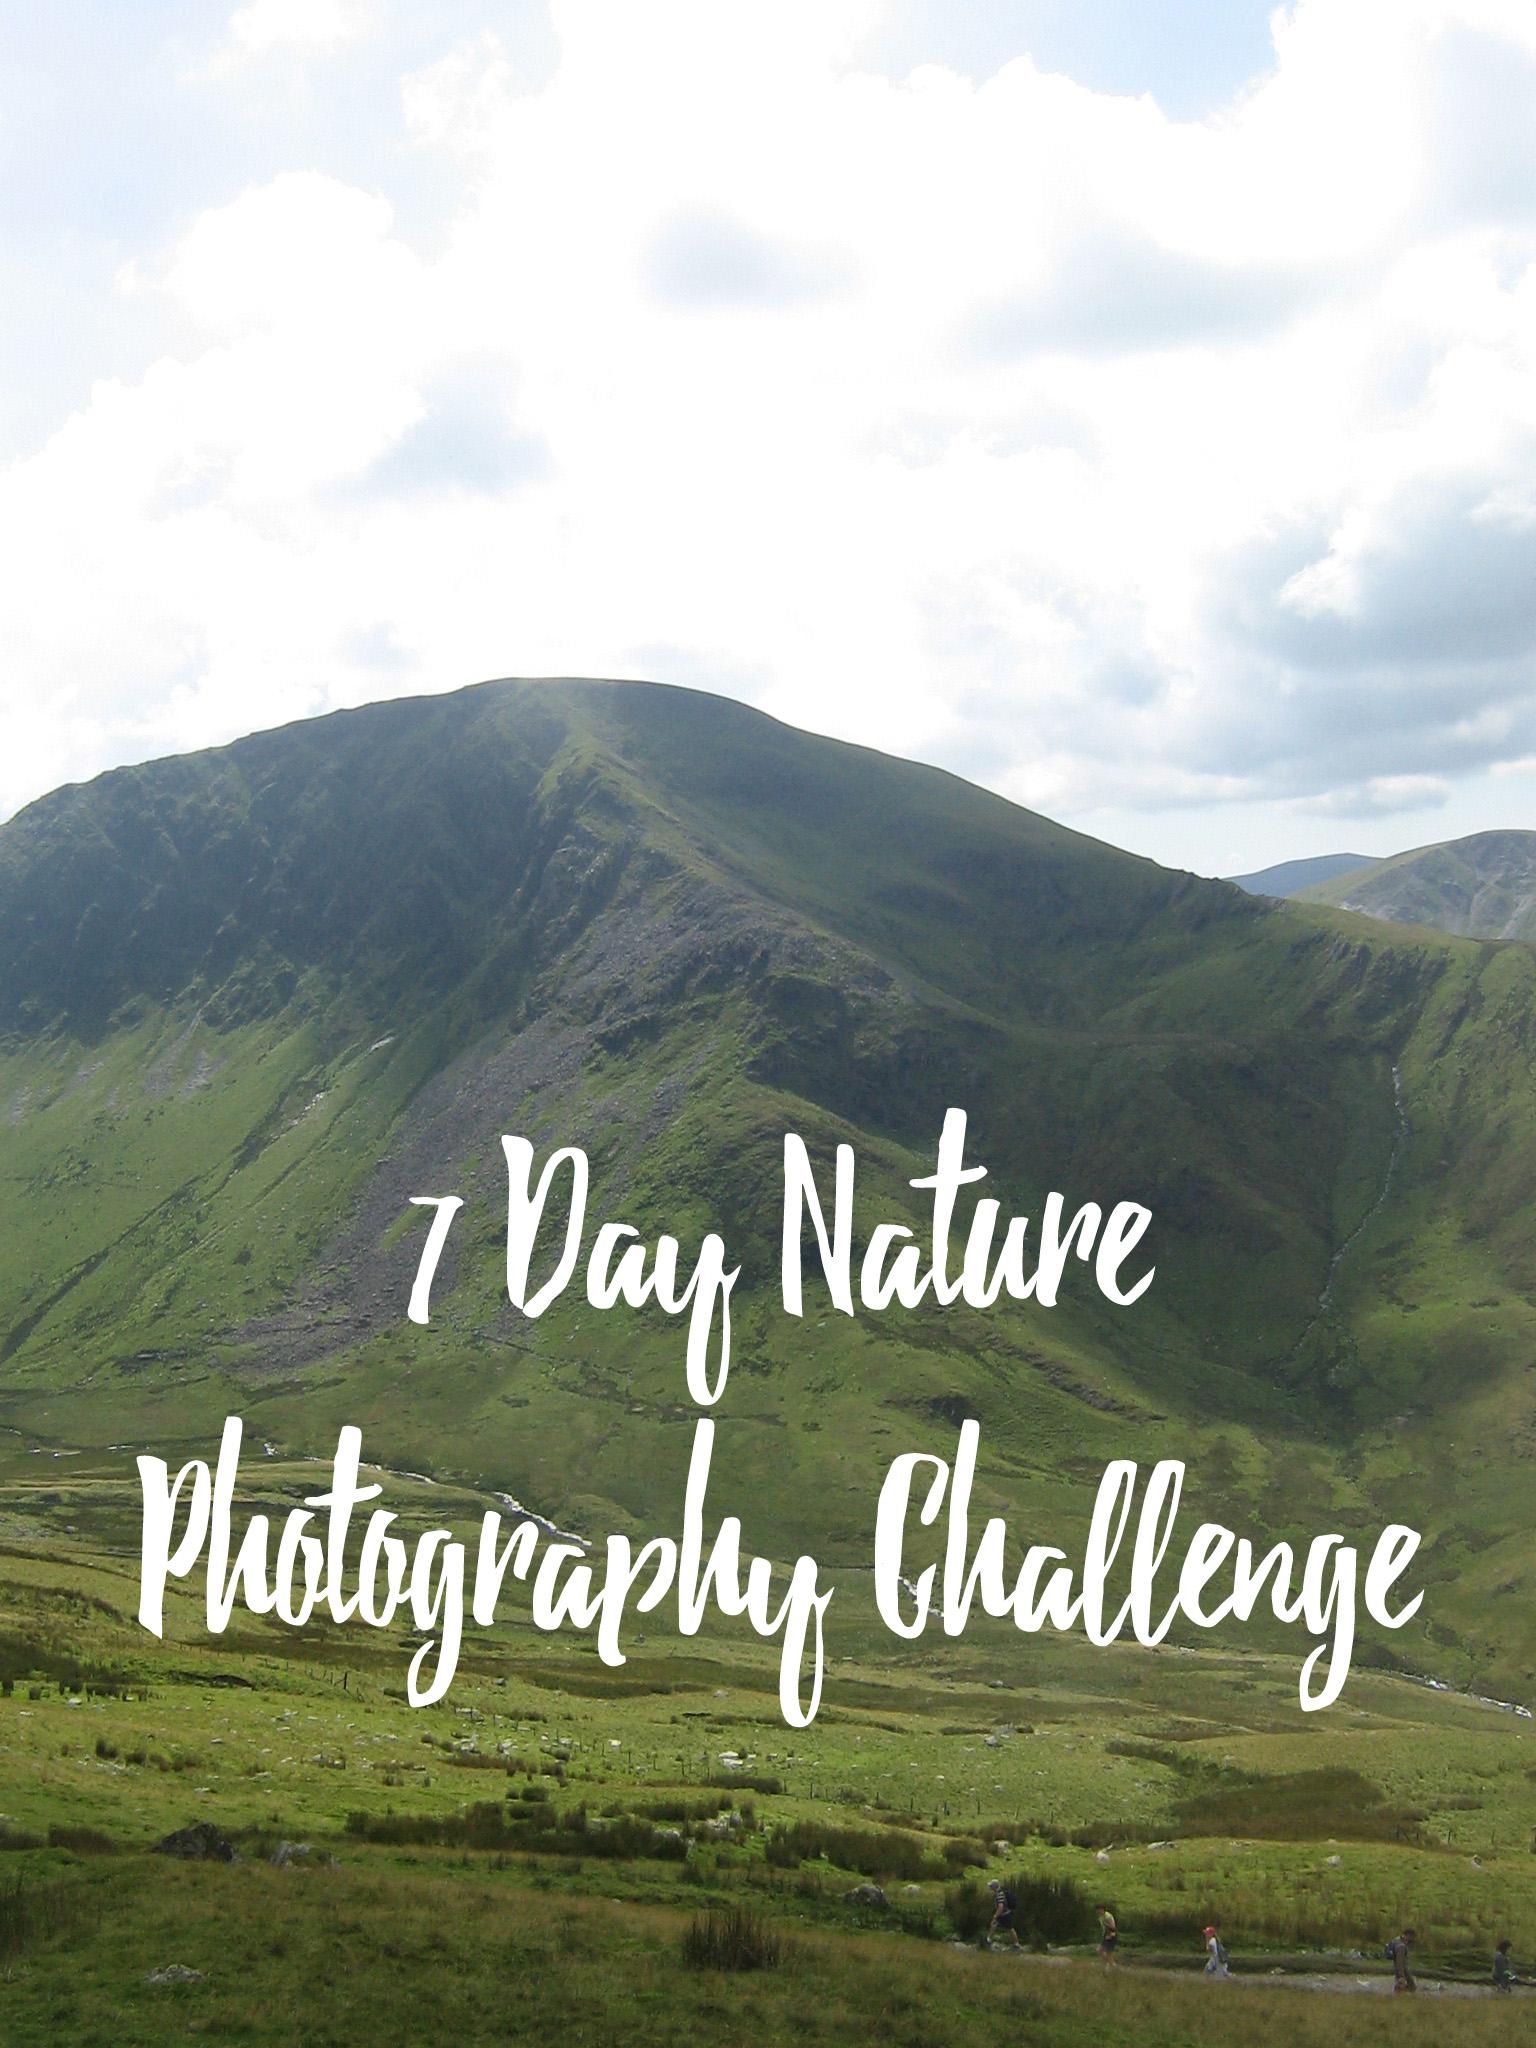 7 Day Nature Photography Tag: Snowdonia, North Wales.